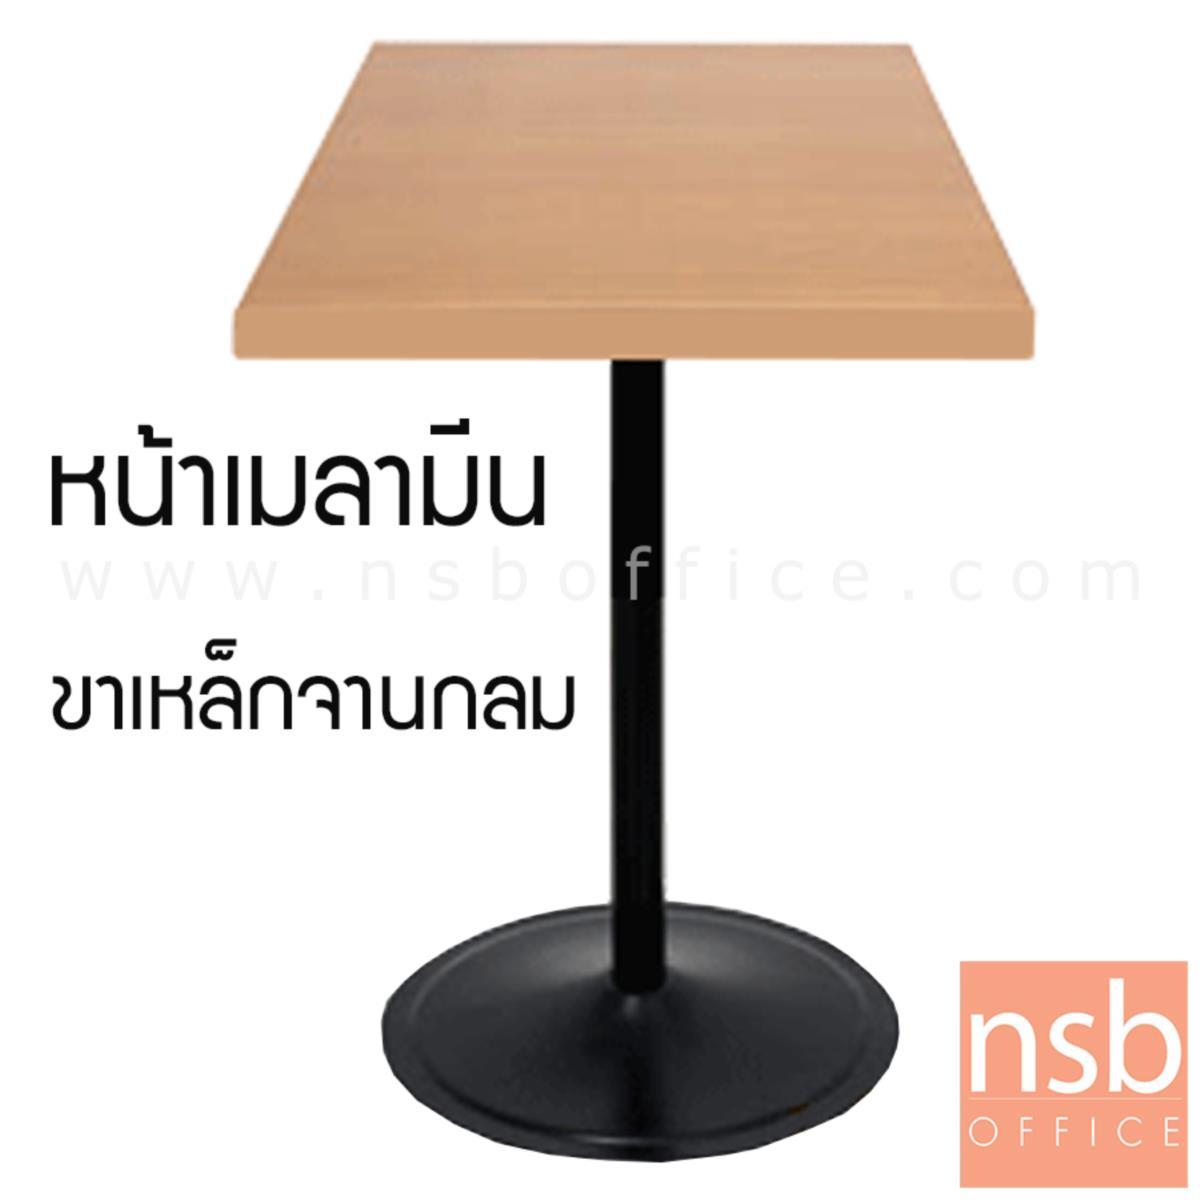 A07A040:โต๊ะหน้าเมลามีน 25 มม. รุ่น  Beaumont 3 (โบมอนต์ 3) ขนาด 60W ,75W ,60Di ,75Di cm.  ขาเหล็กฐานจานกลมสีดำ